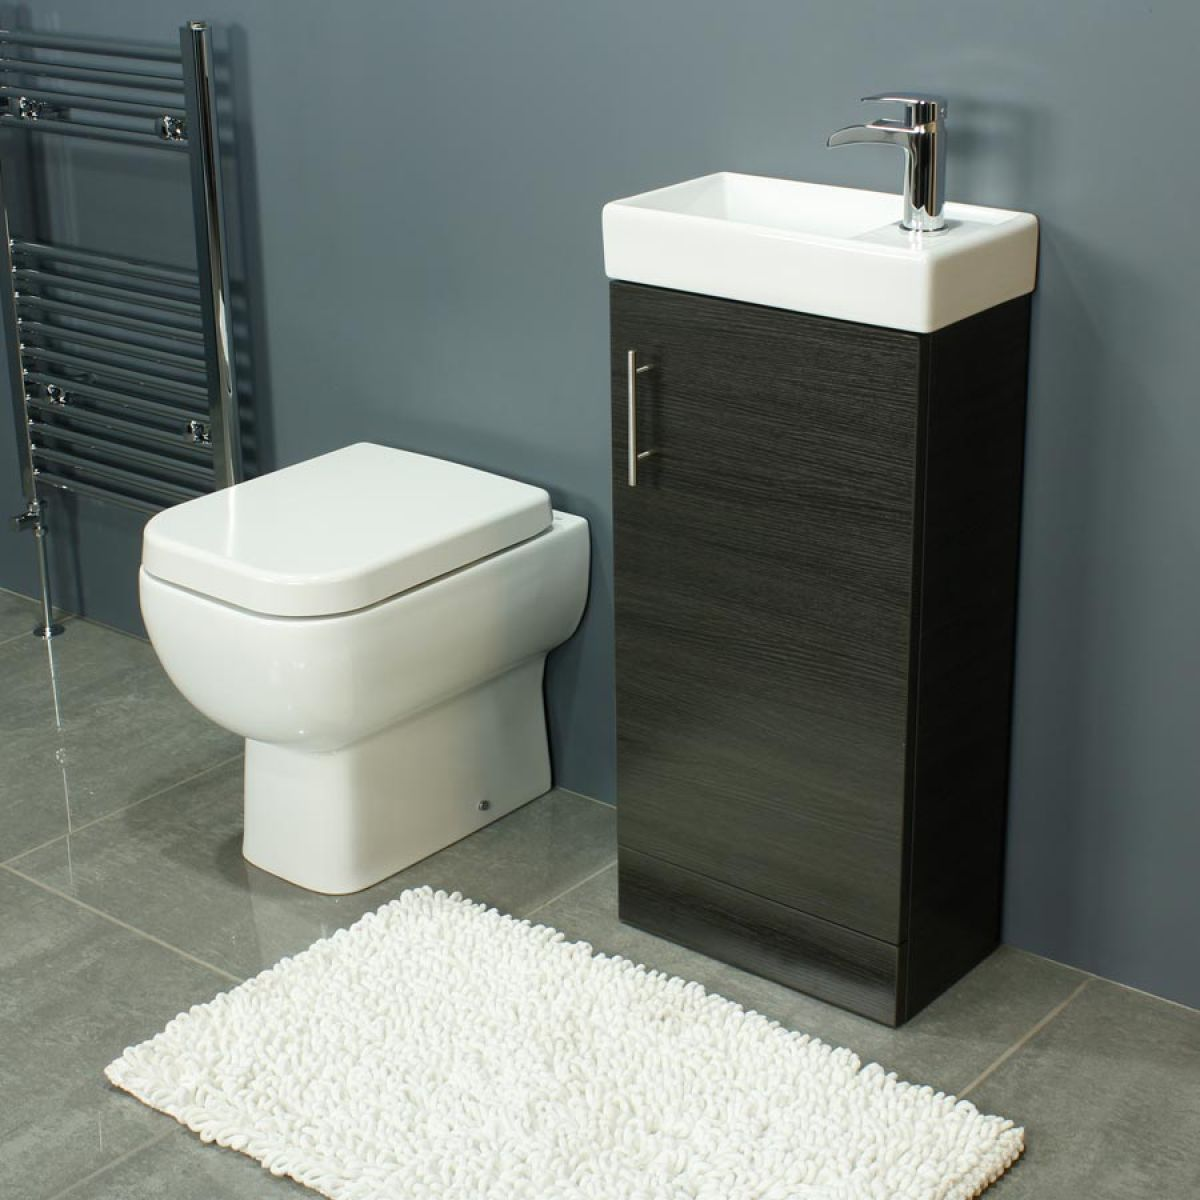 RAK Series 600 Back To Wall Toilet and 400 Series Walnut Vanity Unit